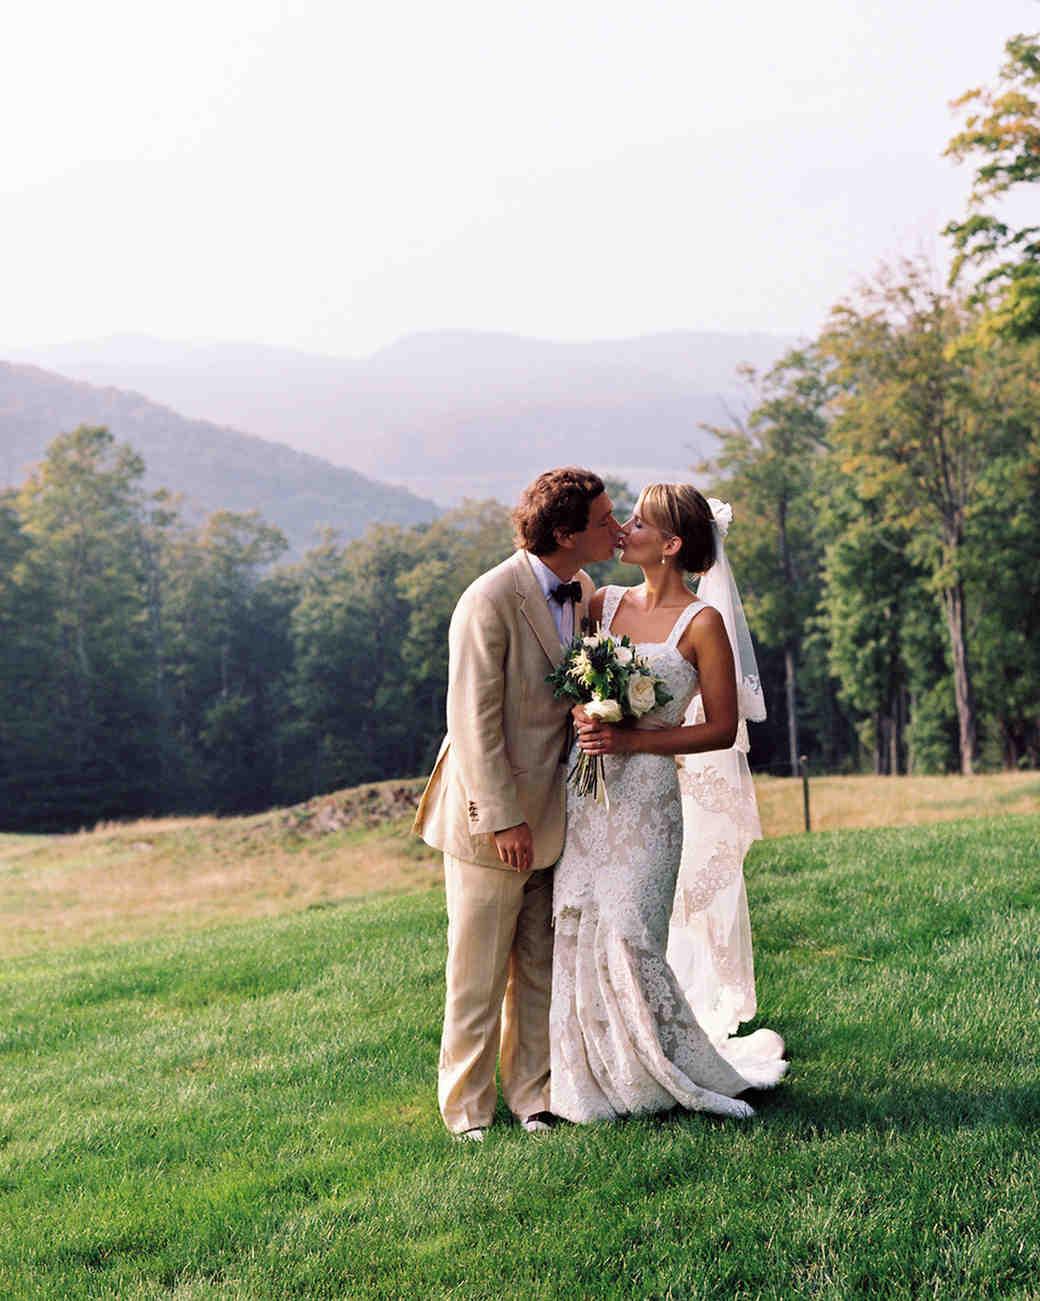 A Casual, Rustic Outdoor Destination Wedding in Vermont